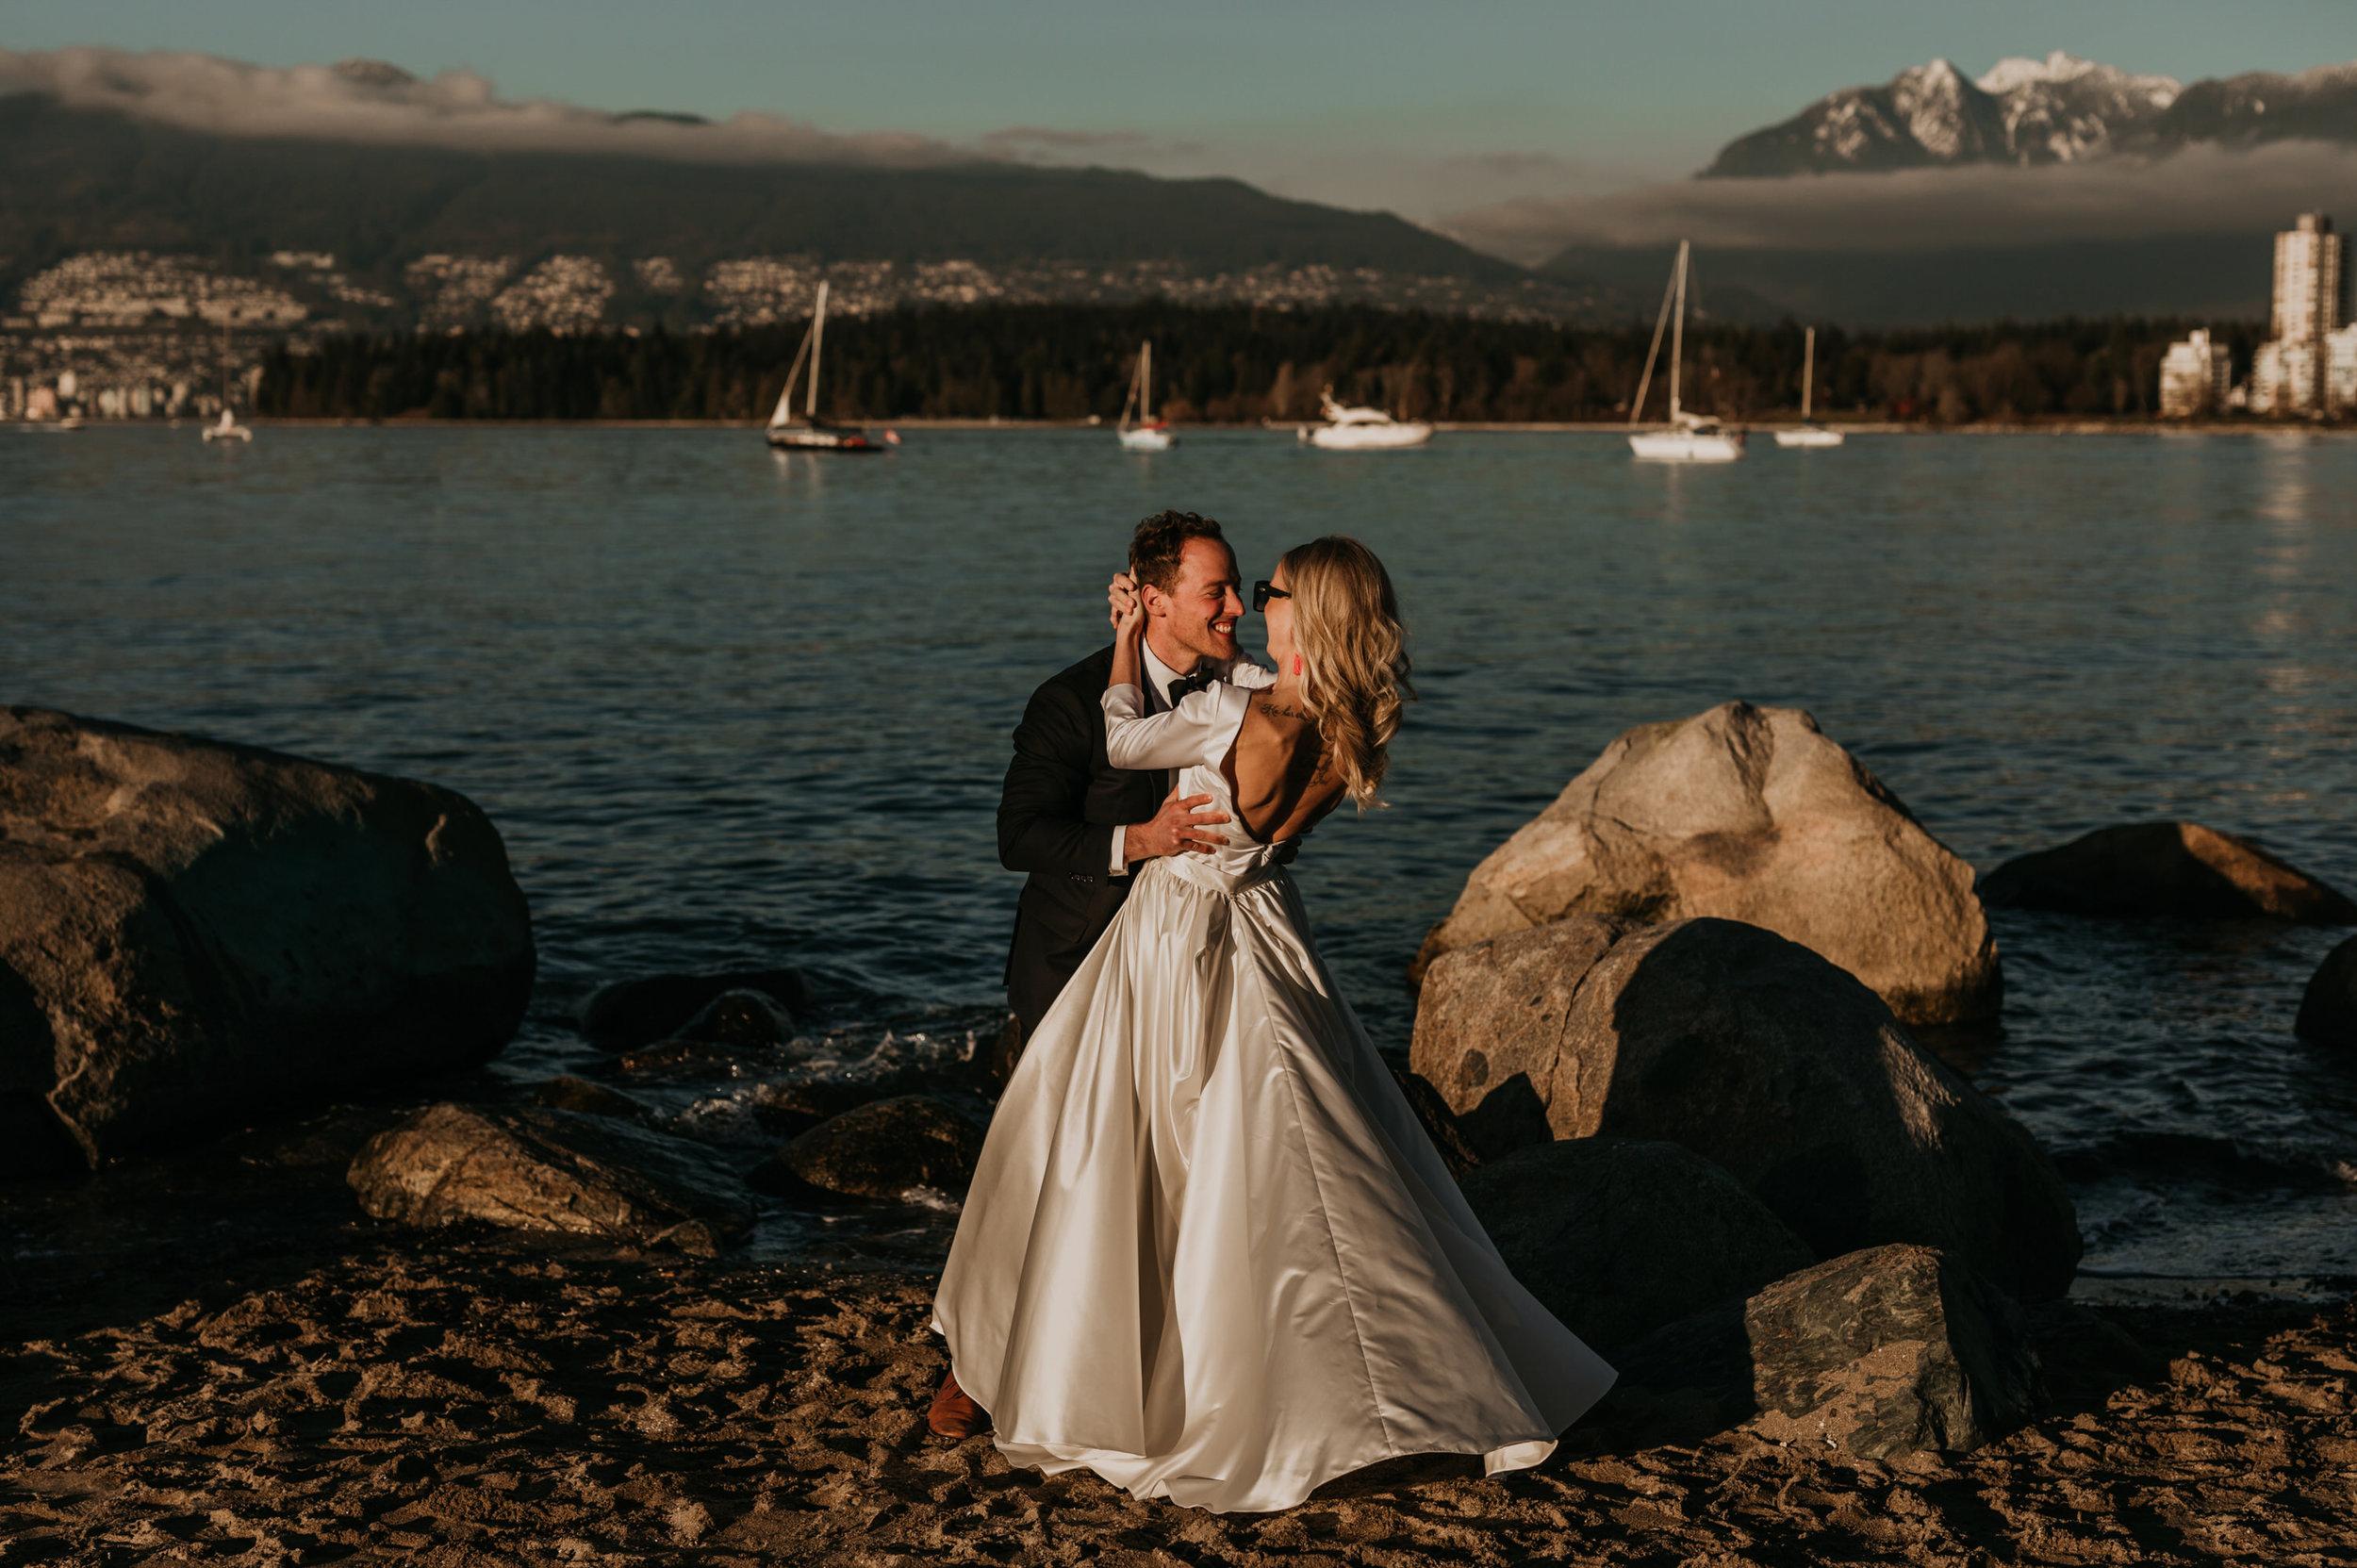 Vancouver Wedding Photos - Vegan Wedding Photographer - New Years Eve Wedding Photos - Vancouver Wedding Photographer - Vancouver Wedding Videographer - 625.JPG